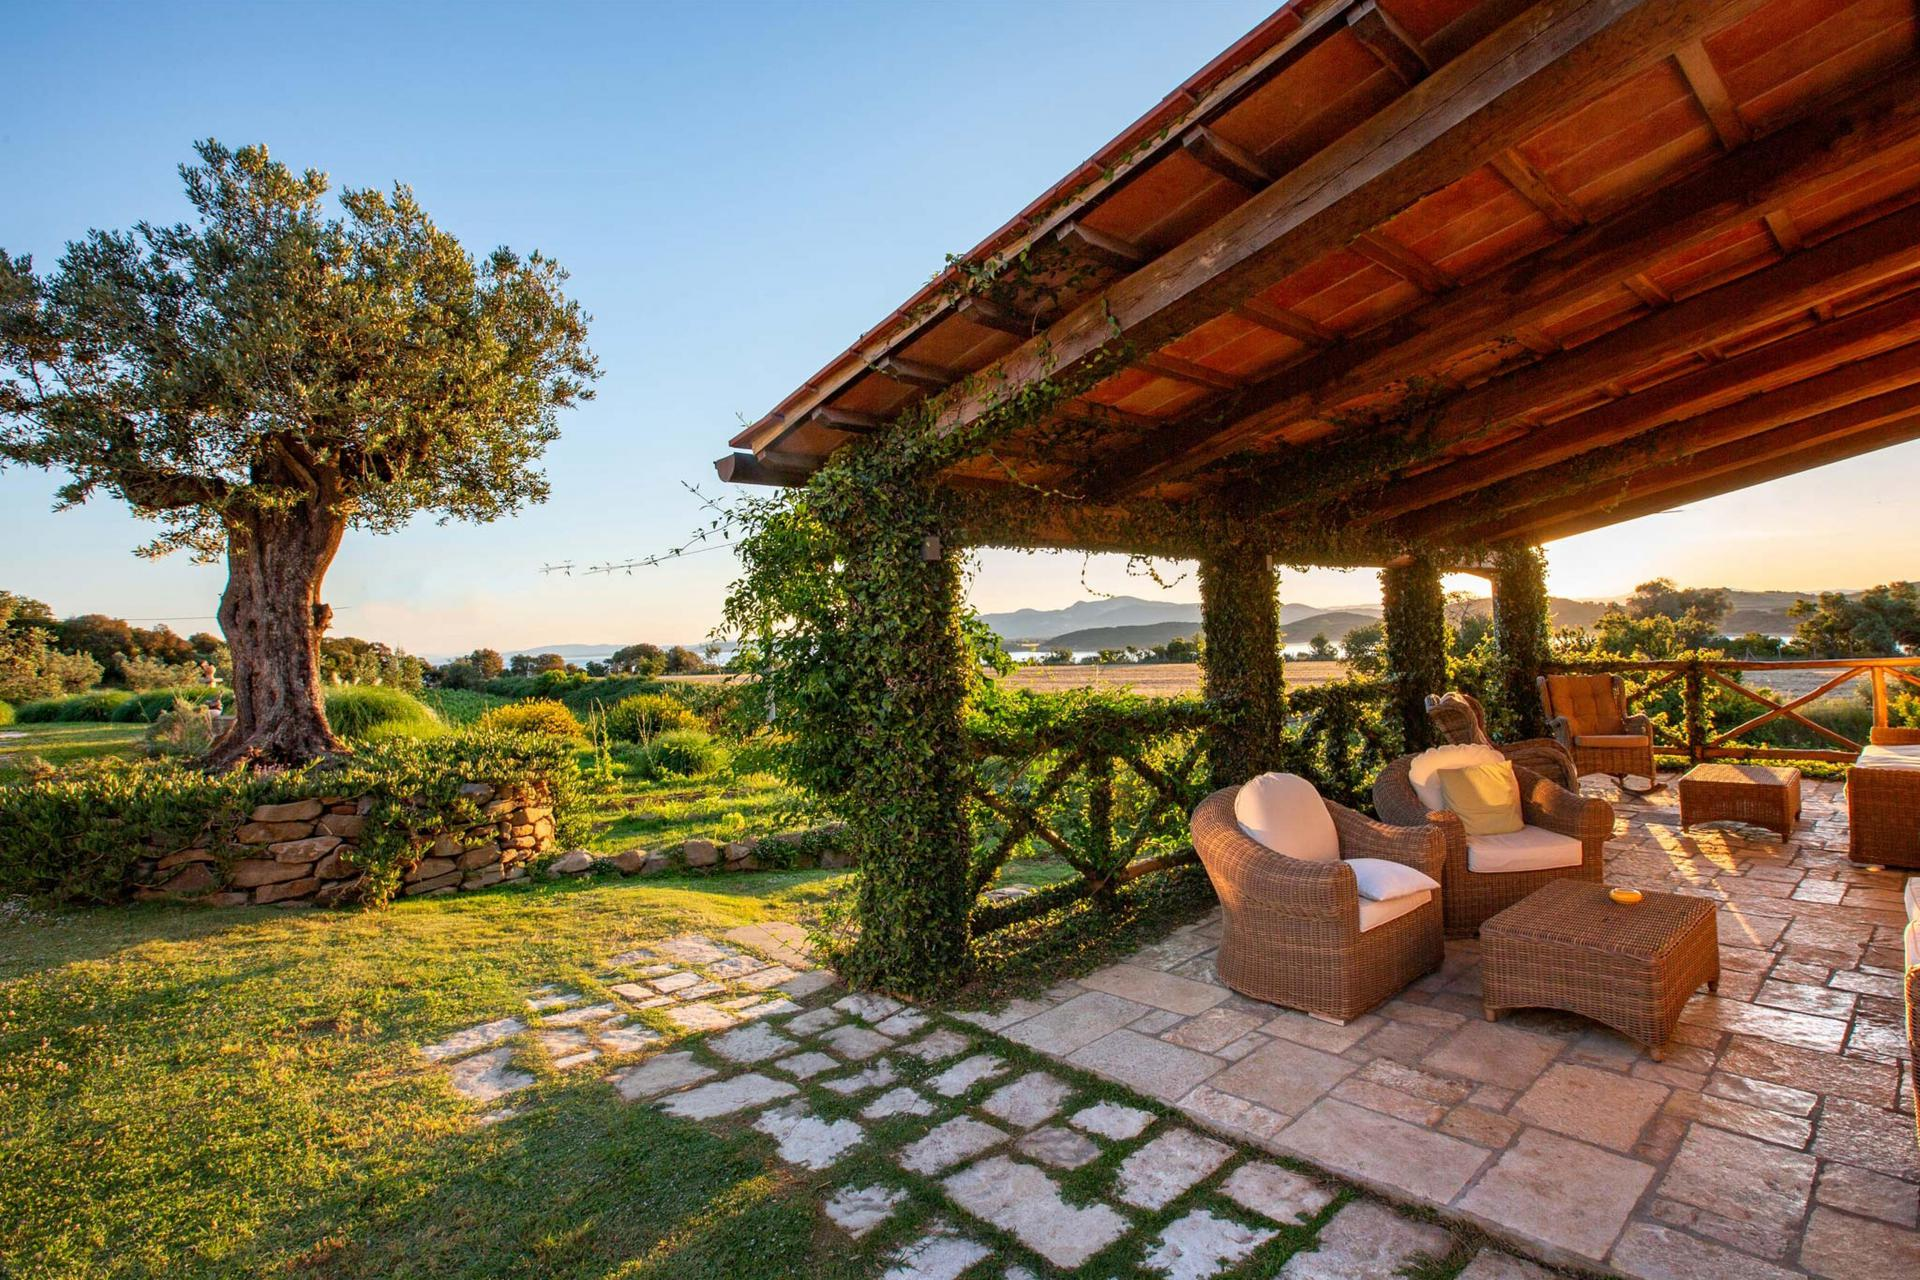 Agriturismo Puglia Agriturismo autentico con una bella piscina in Puglia